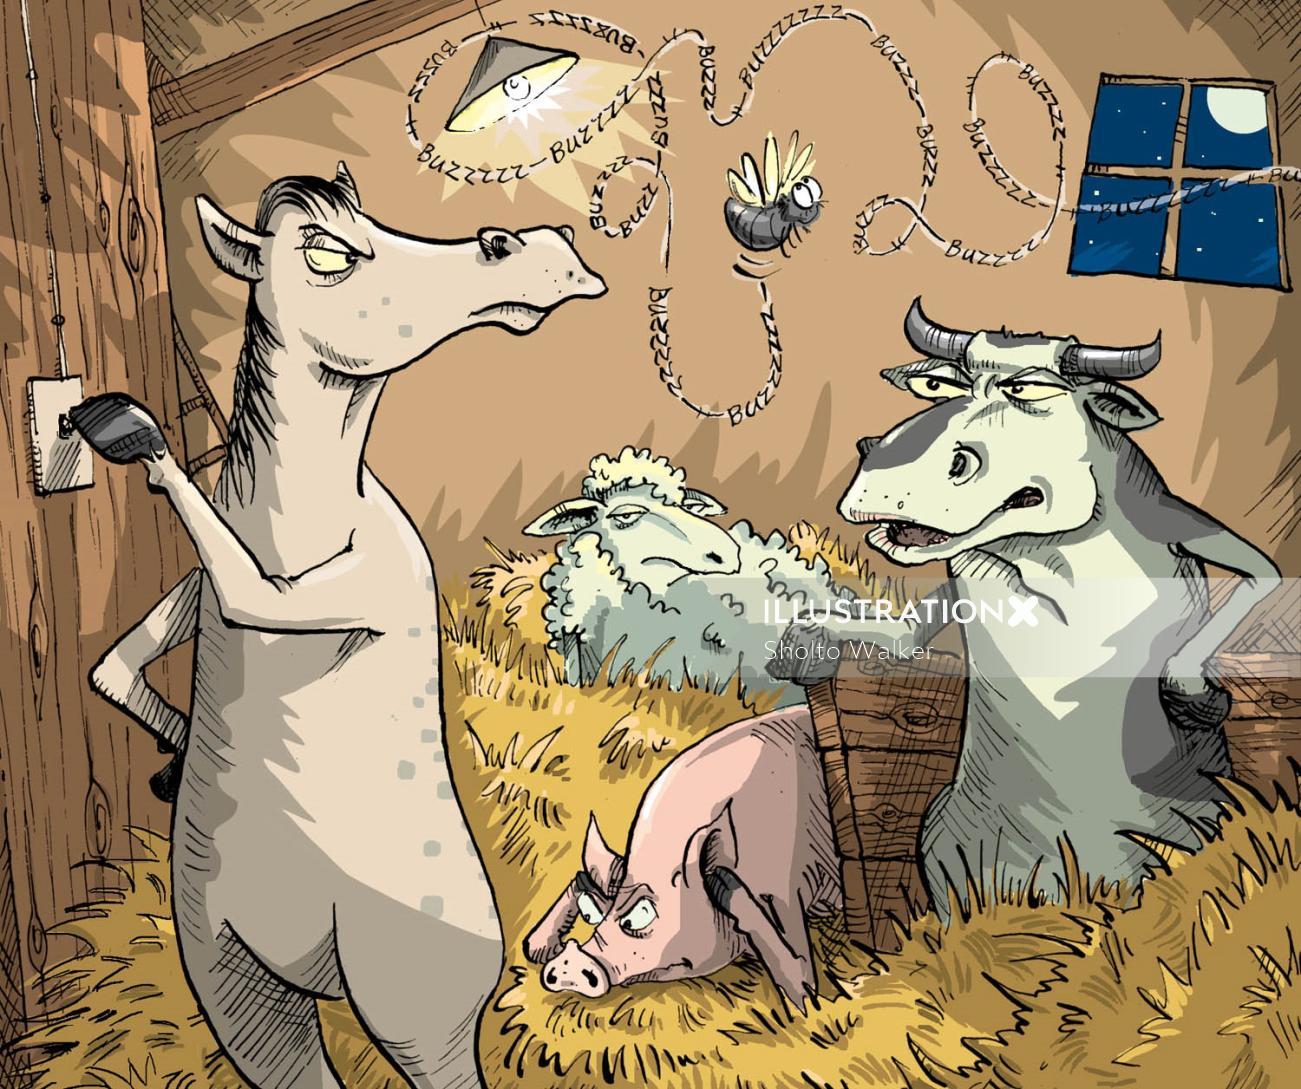 Comic farm animals illustration by Sholto Walker